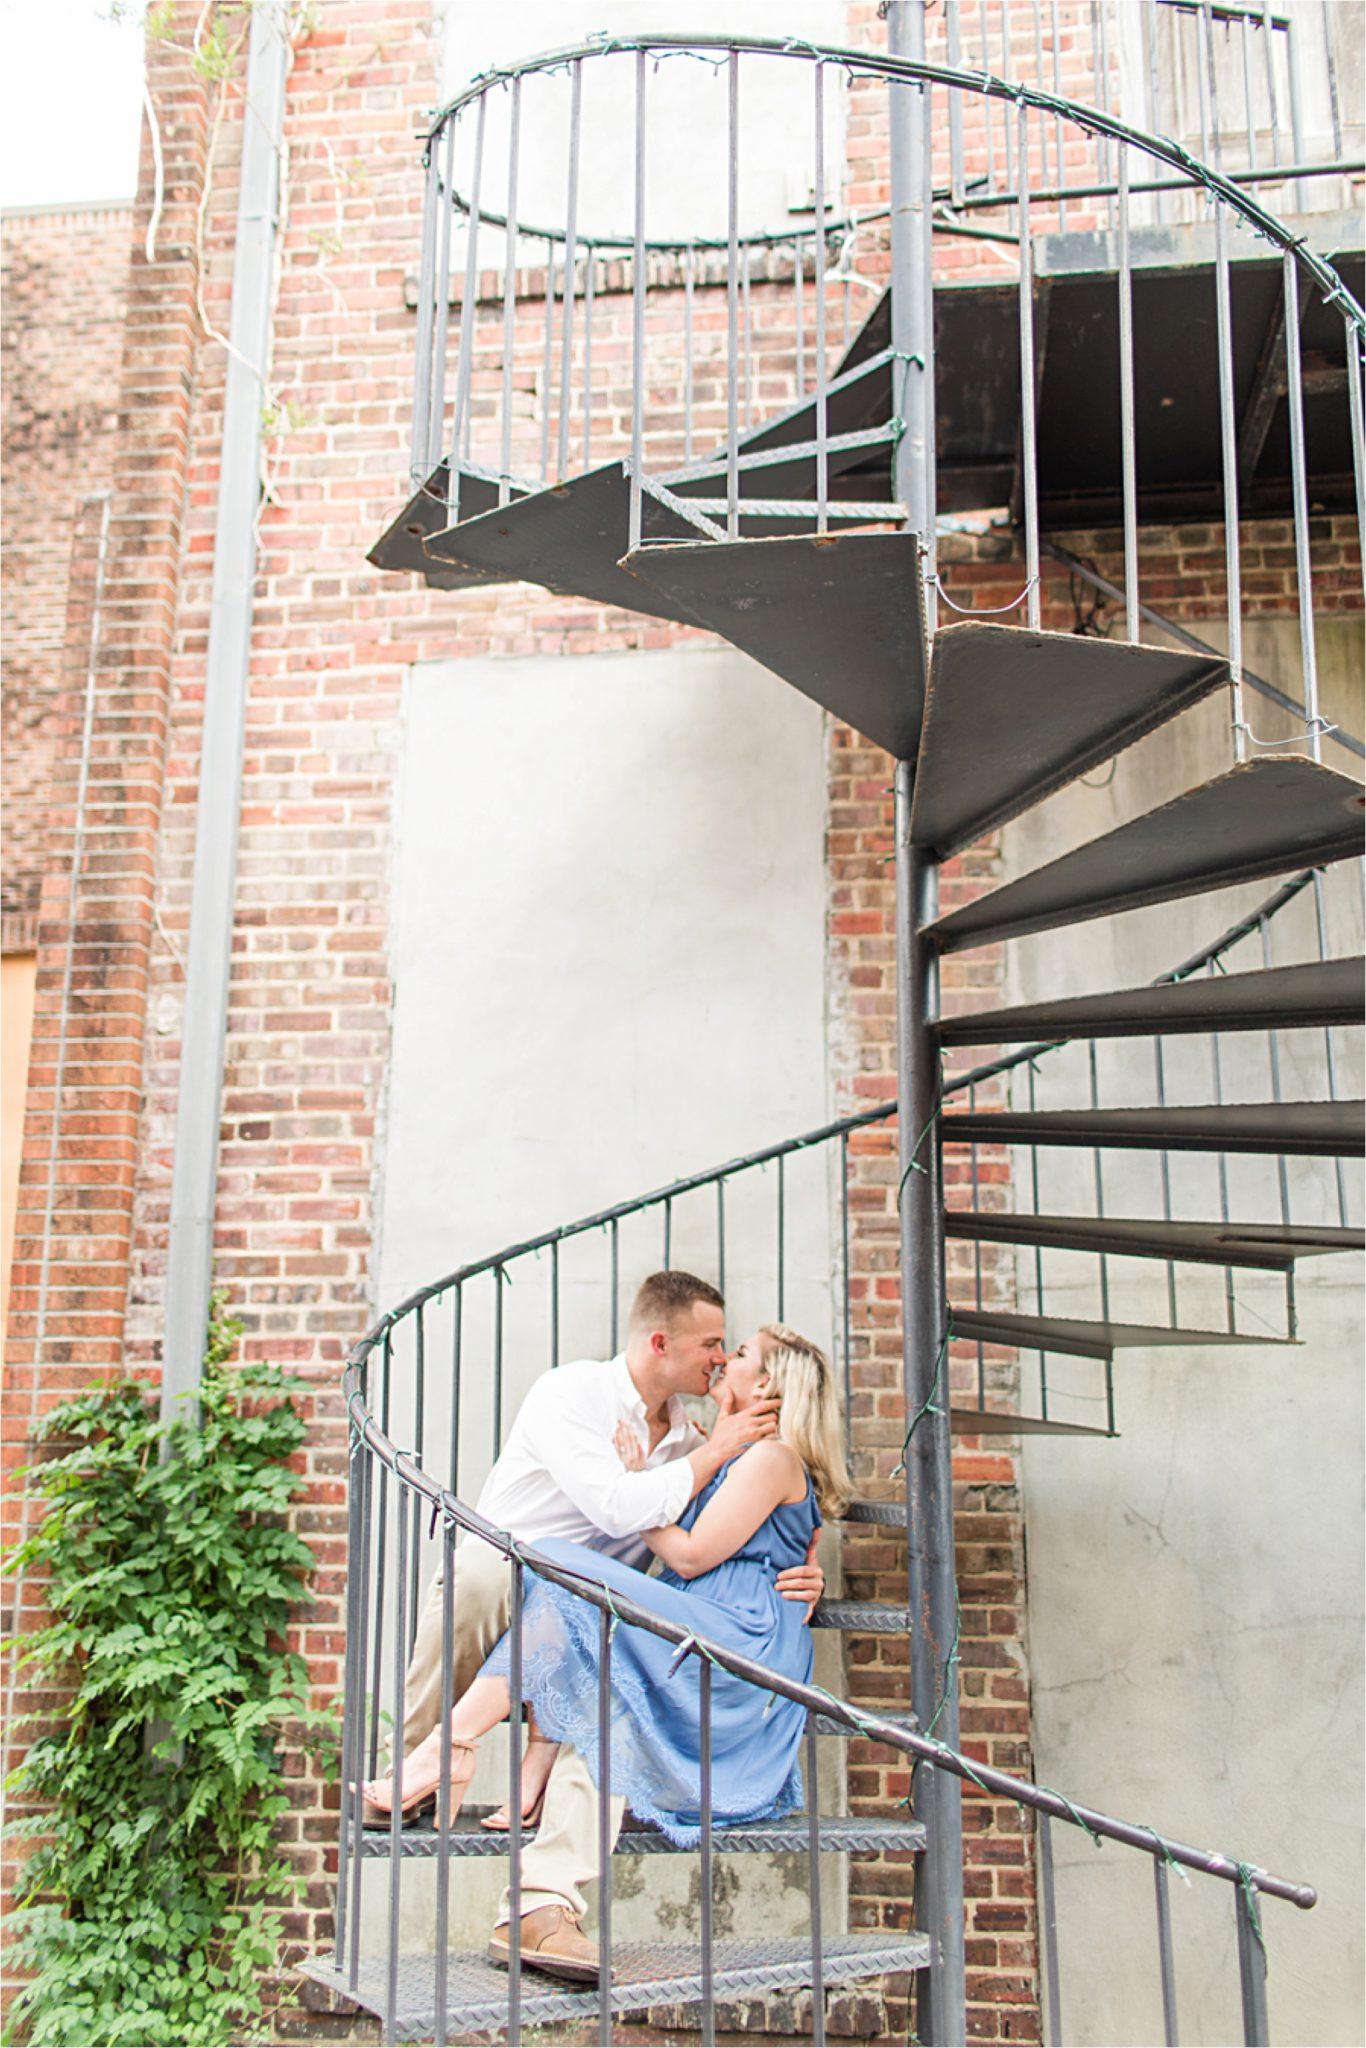 Laurel Mississippi, Brett & Sarah, Romantic Military Engagement, Mobile Alabama Photographer, Engagement Shoot Inspiration, Blue Themed Engagement